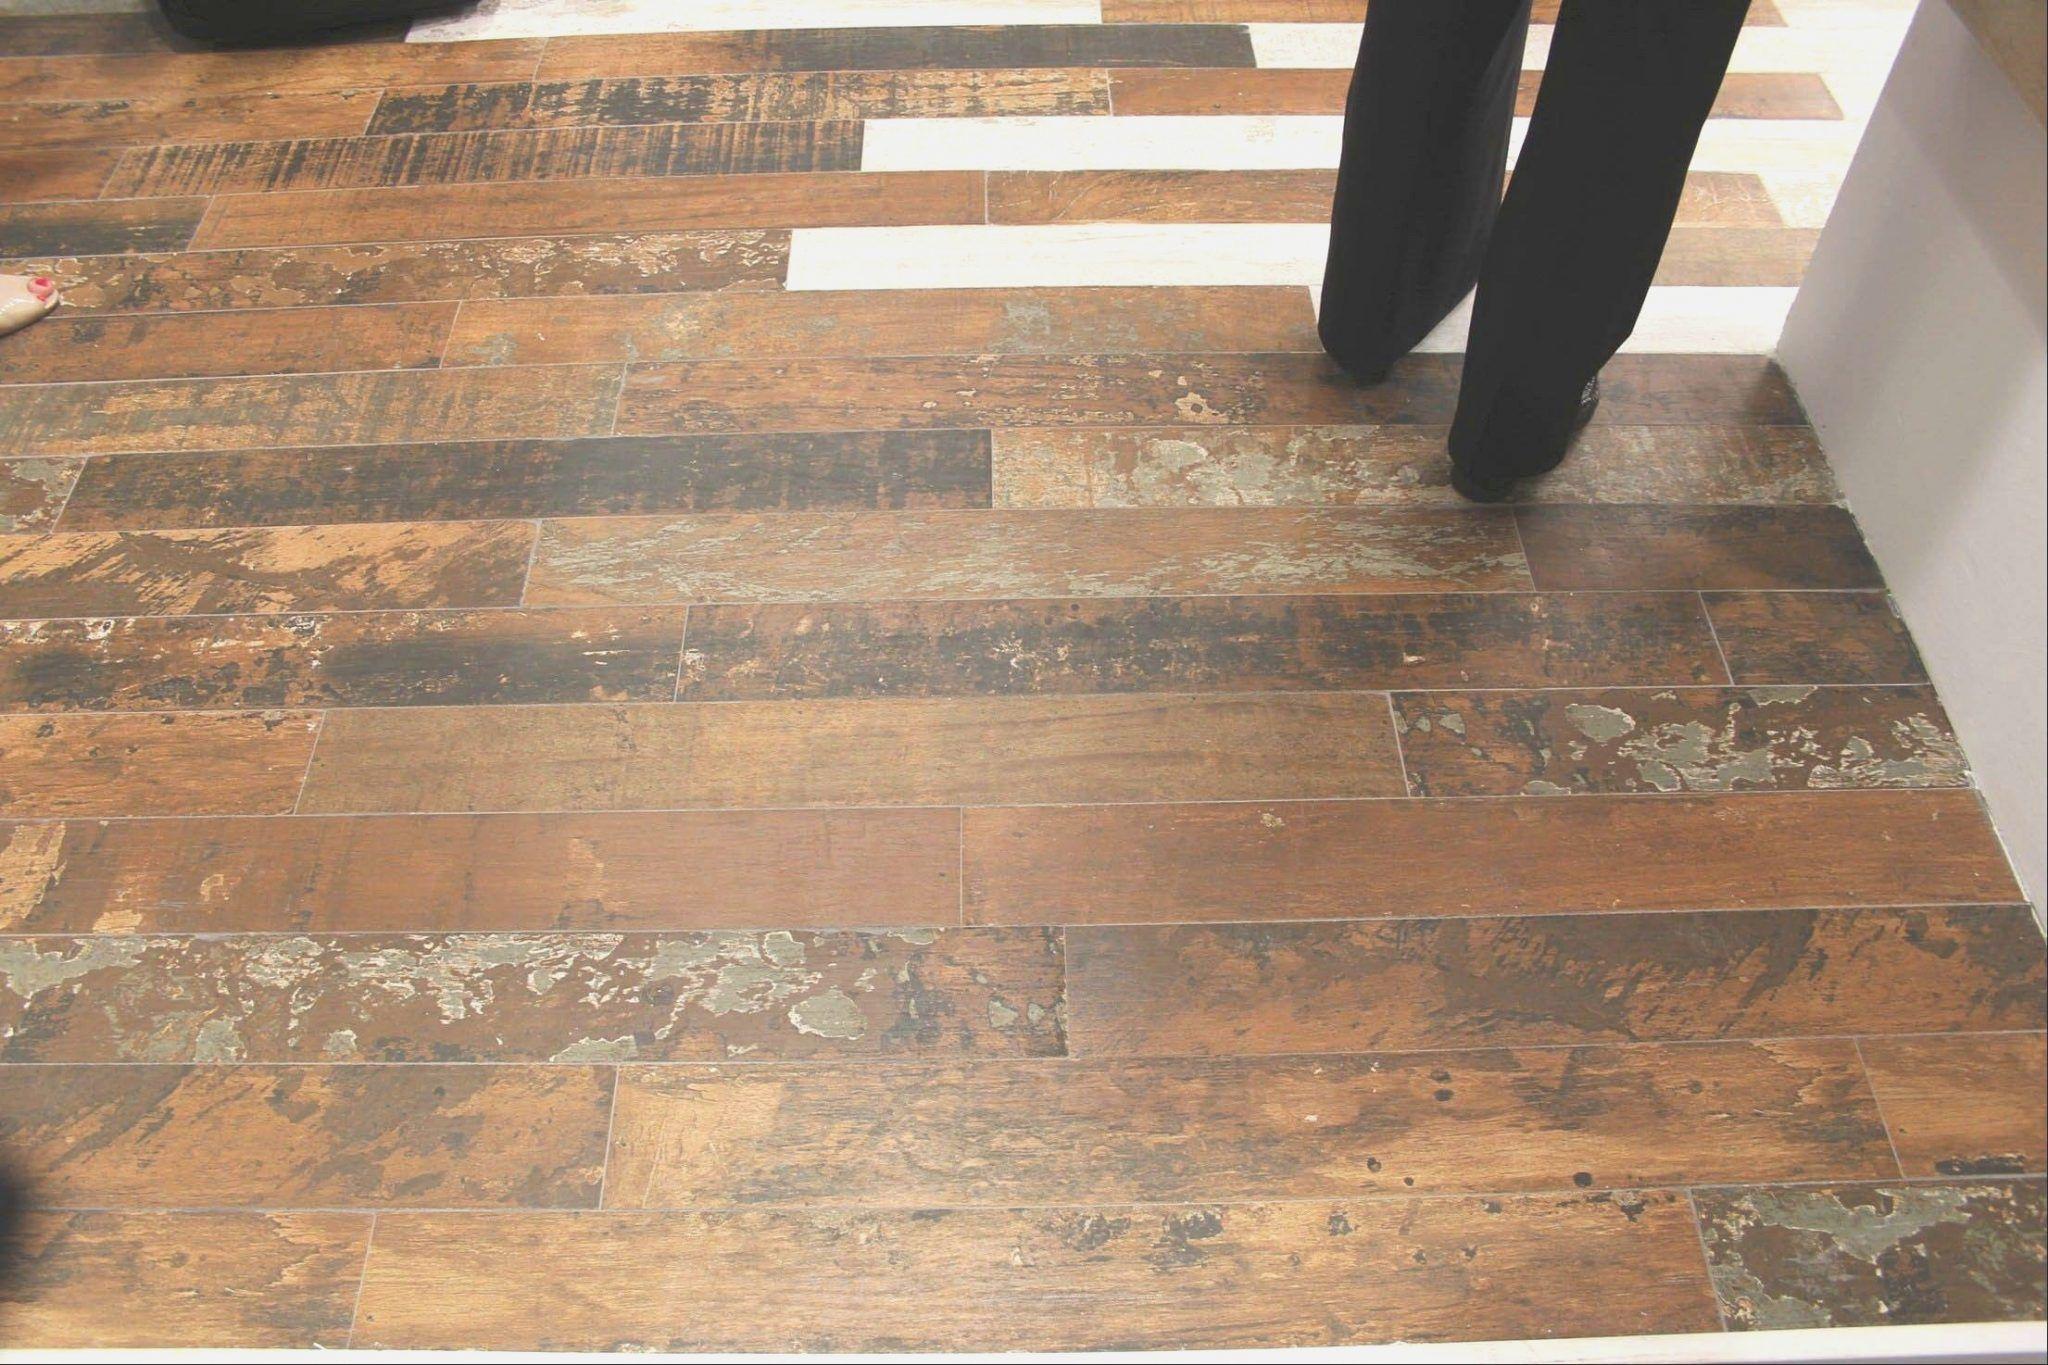 Home Depot Kitchen Floor Tile home depot floor tiles for kitchen